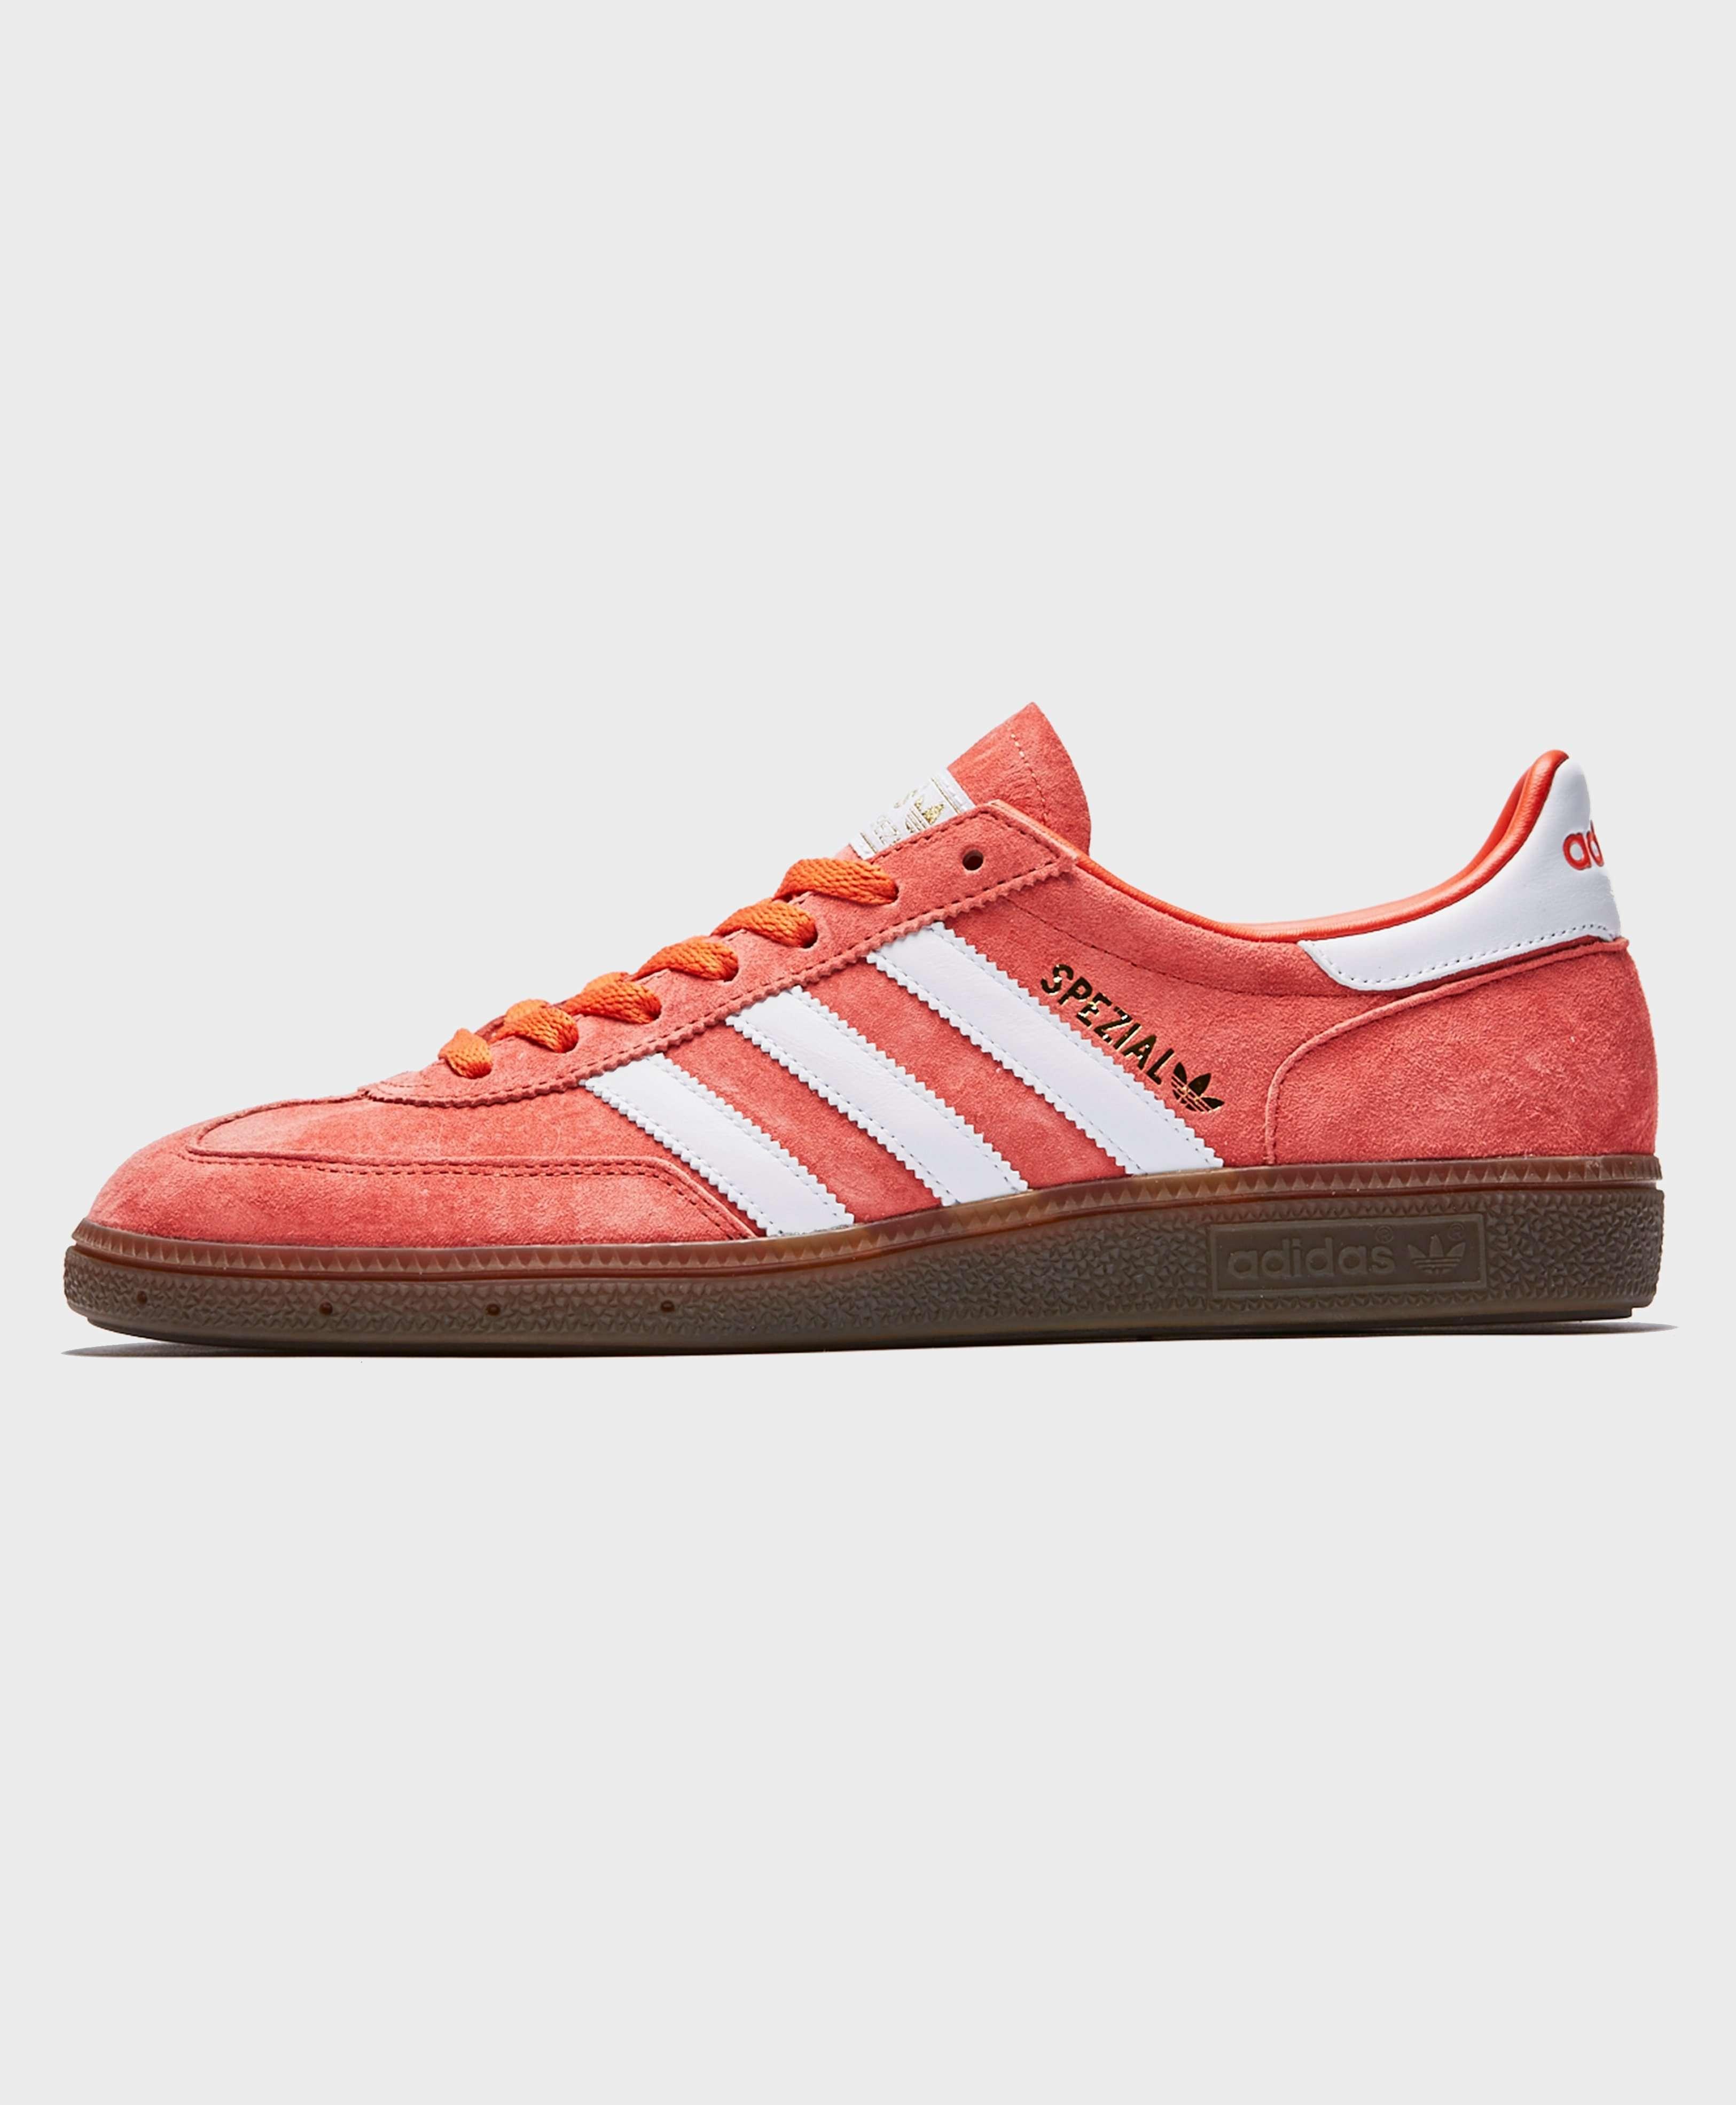 36abd1b2d92 adidas Originals Handball Spezial